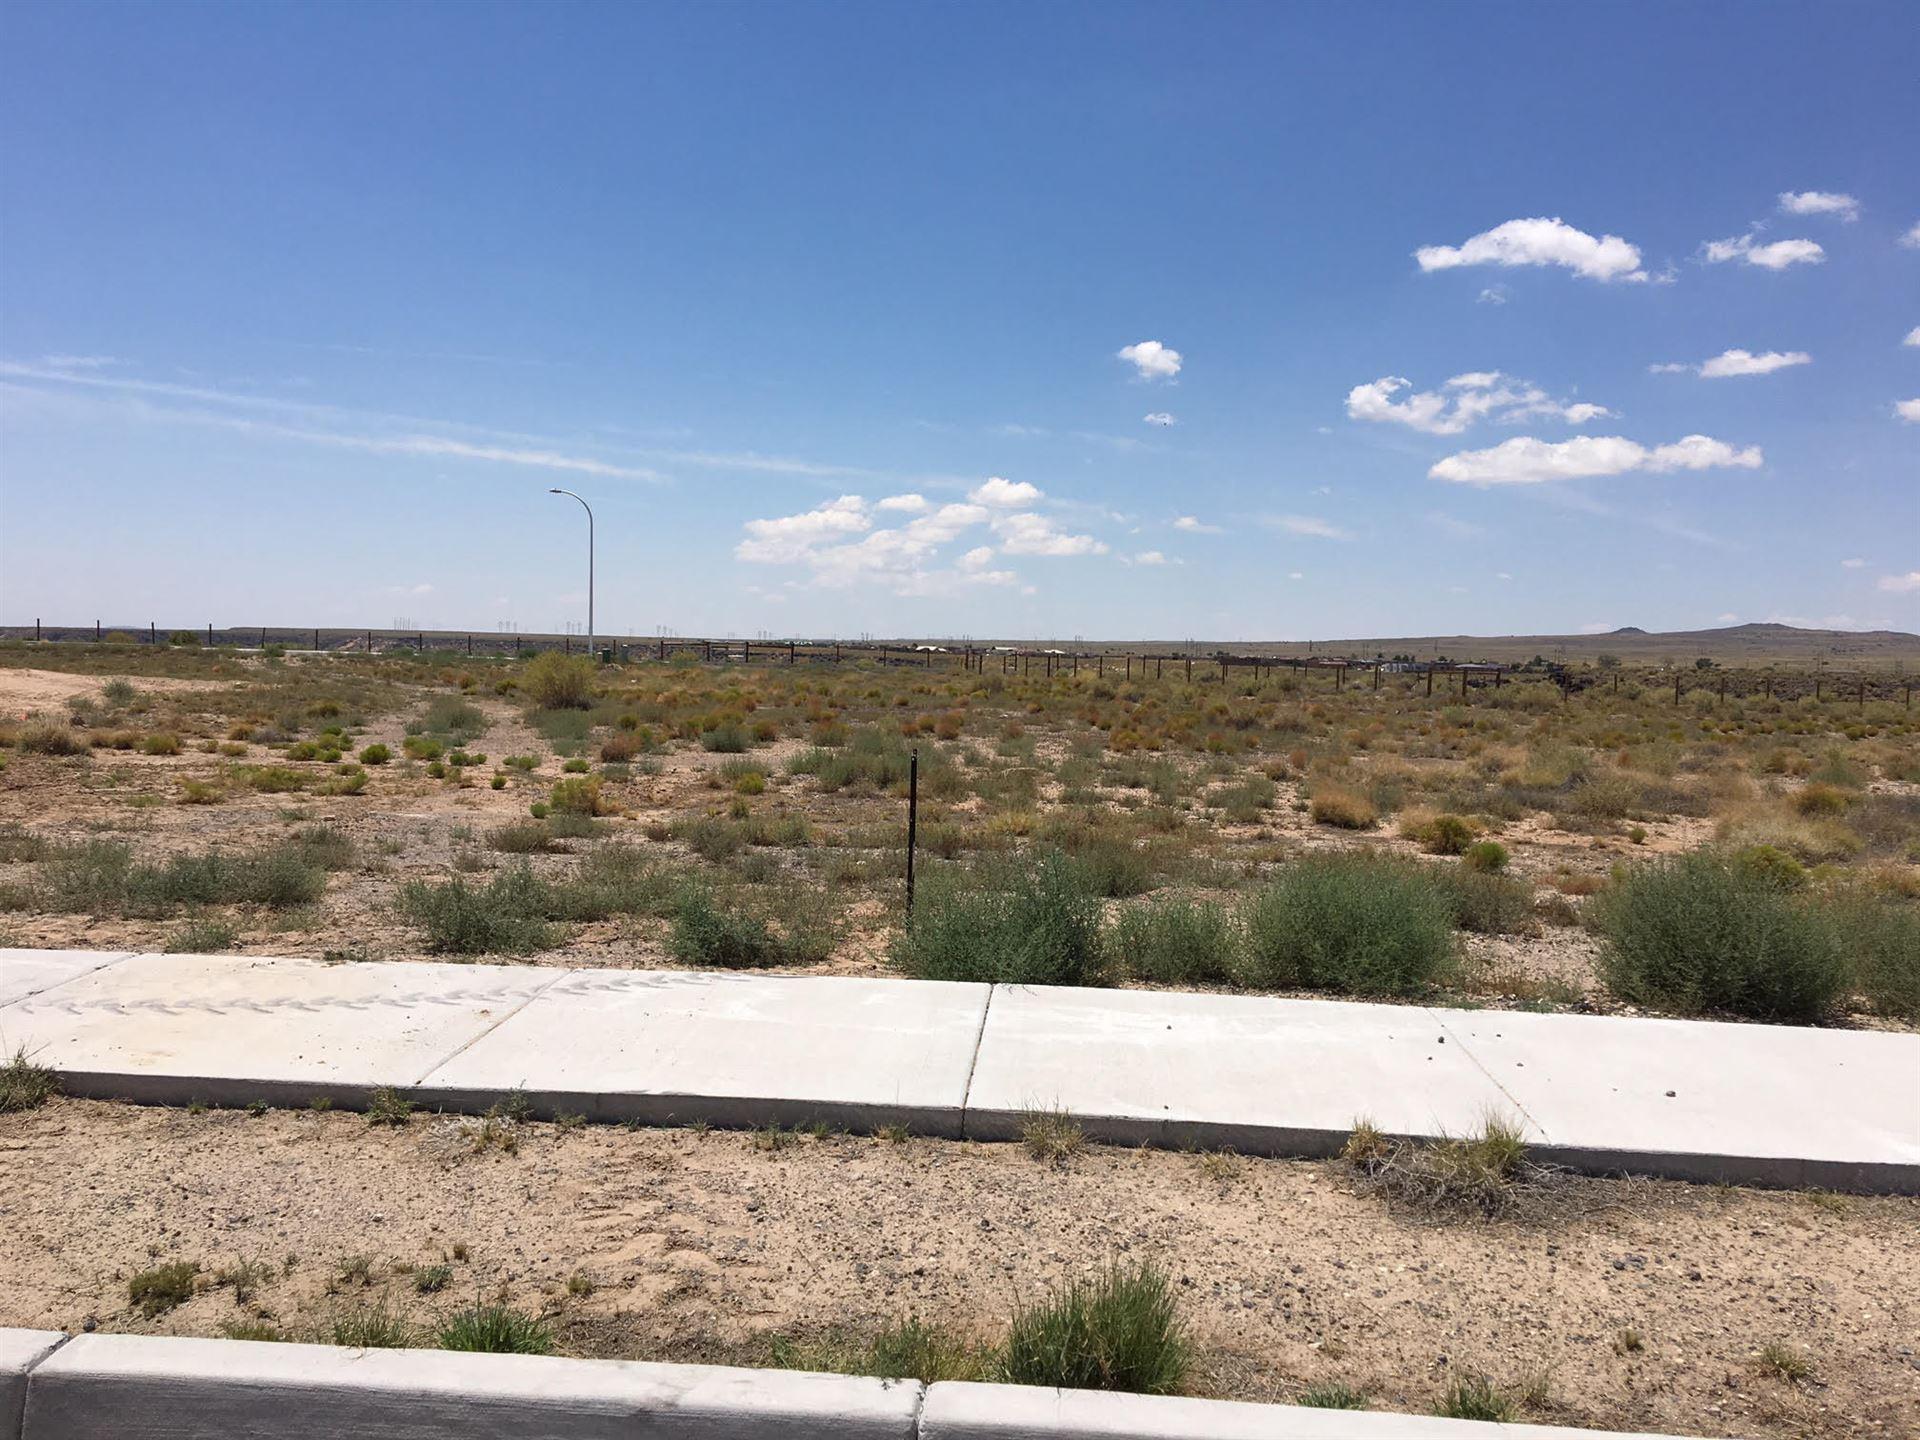 Photo for 6524 Camino Del Oeste NW, Albuquerque, NM 87120 (MLS # 910984)